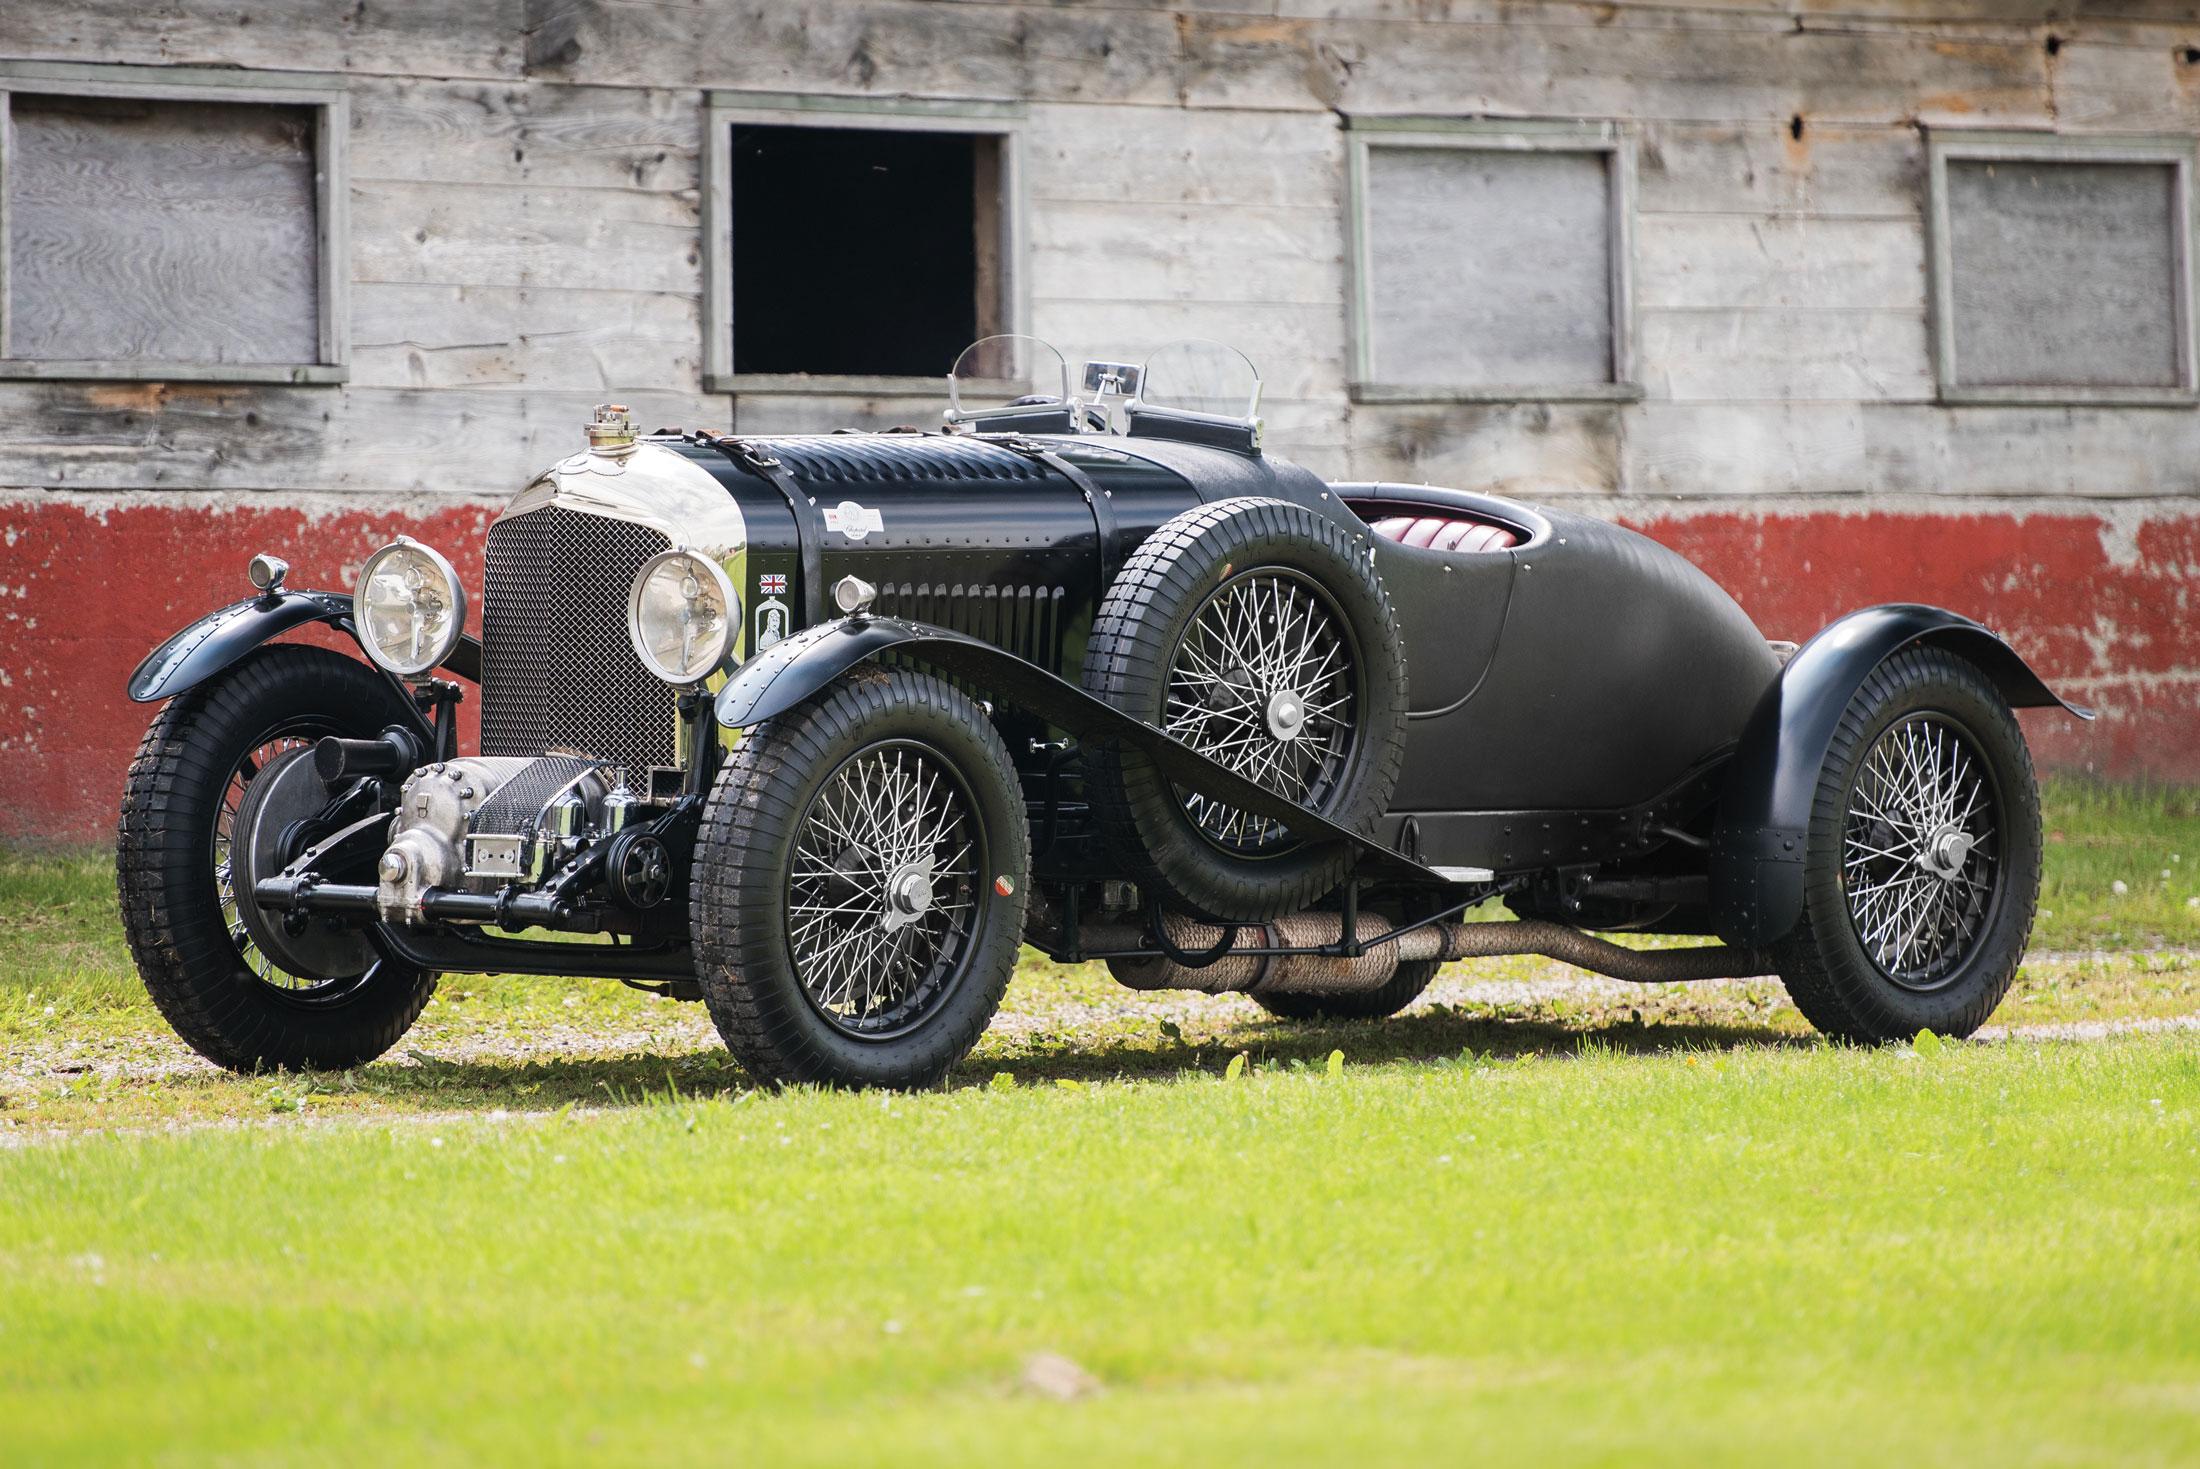 1931 Bentley 4.5 Litre Supercharged  | RM Sotheby's | Estimate: $5.5 Million